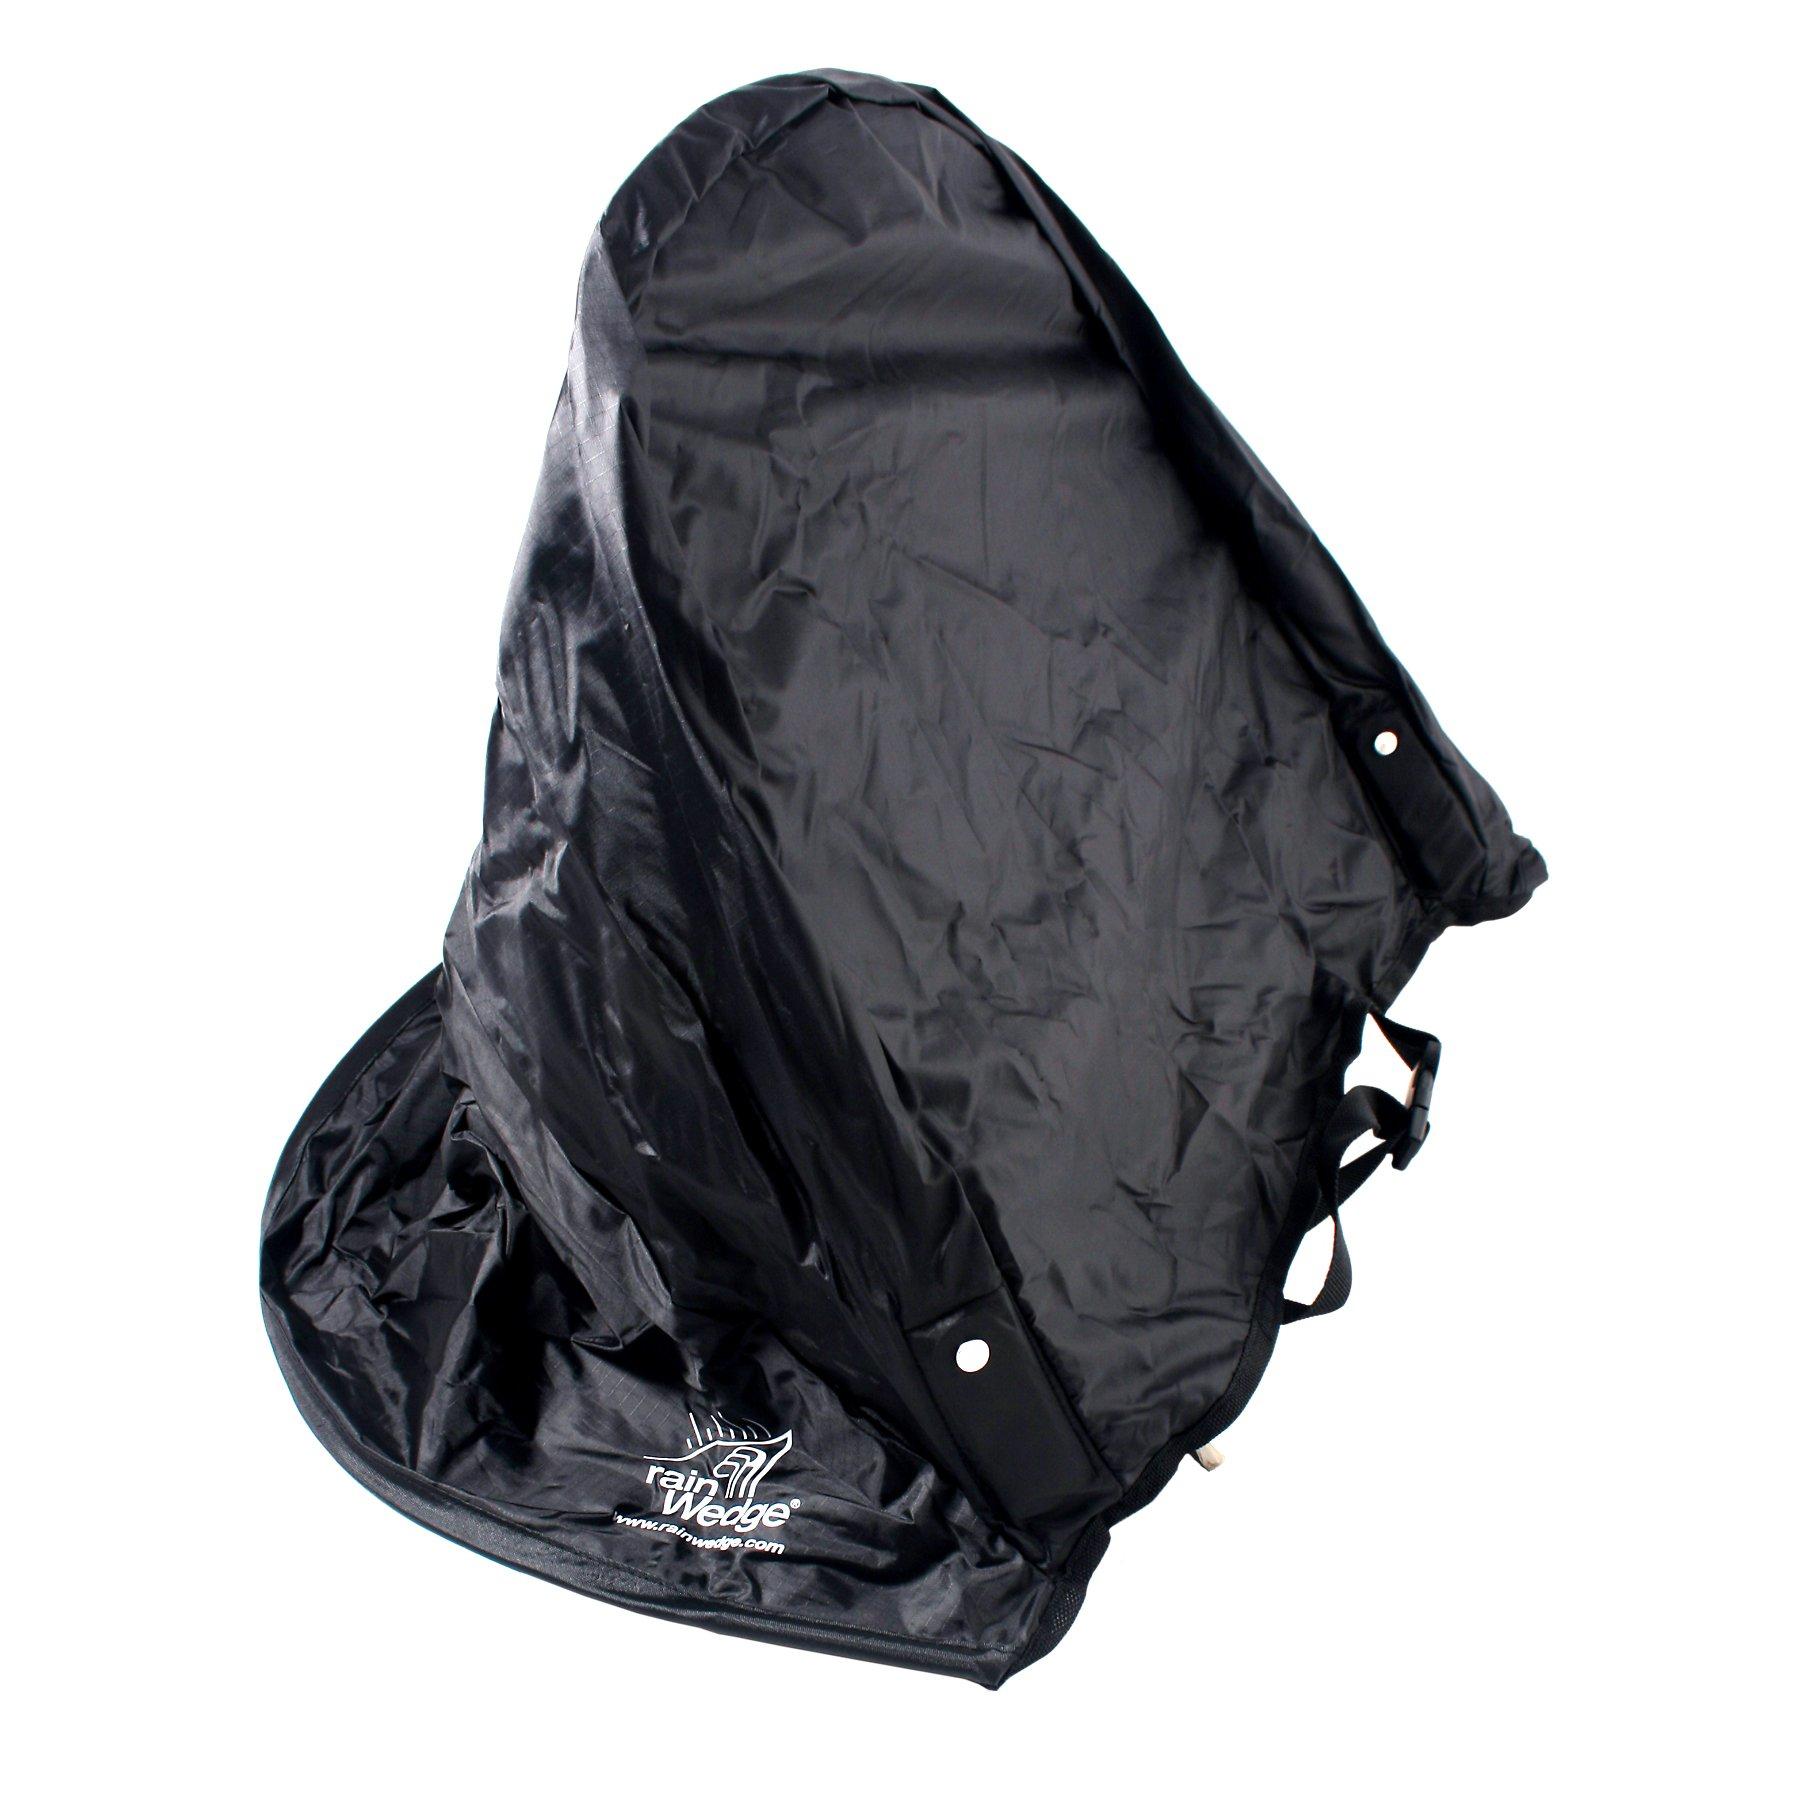 Rain Wedge Easy Access Golf Bag Rain Hood/Cover by ProActive Sports